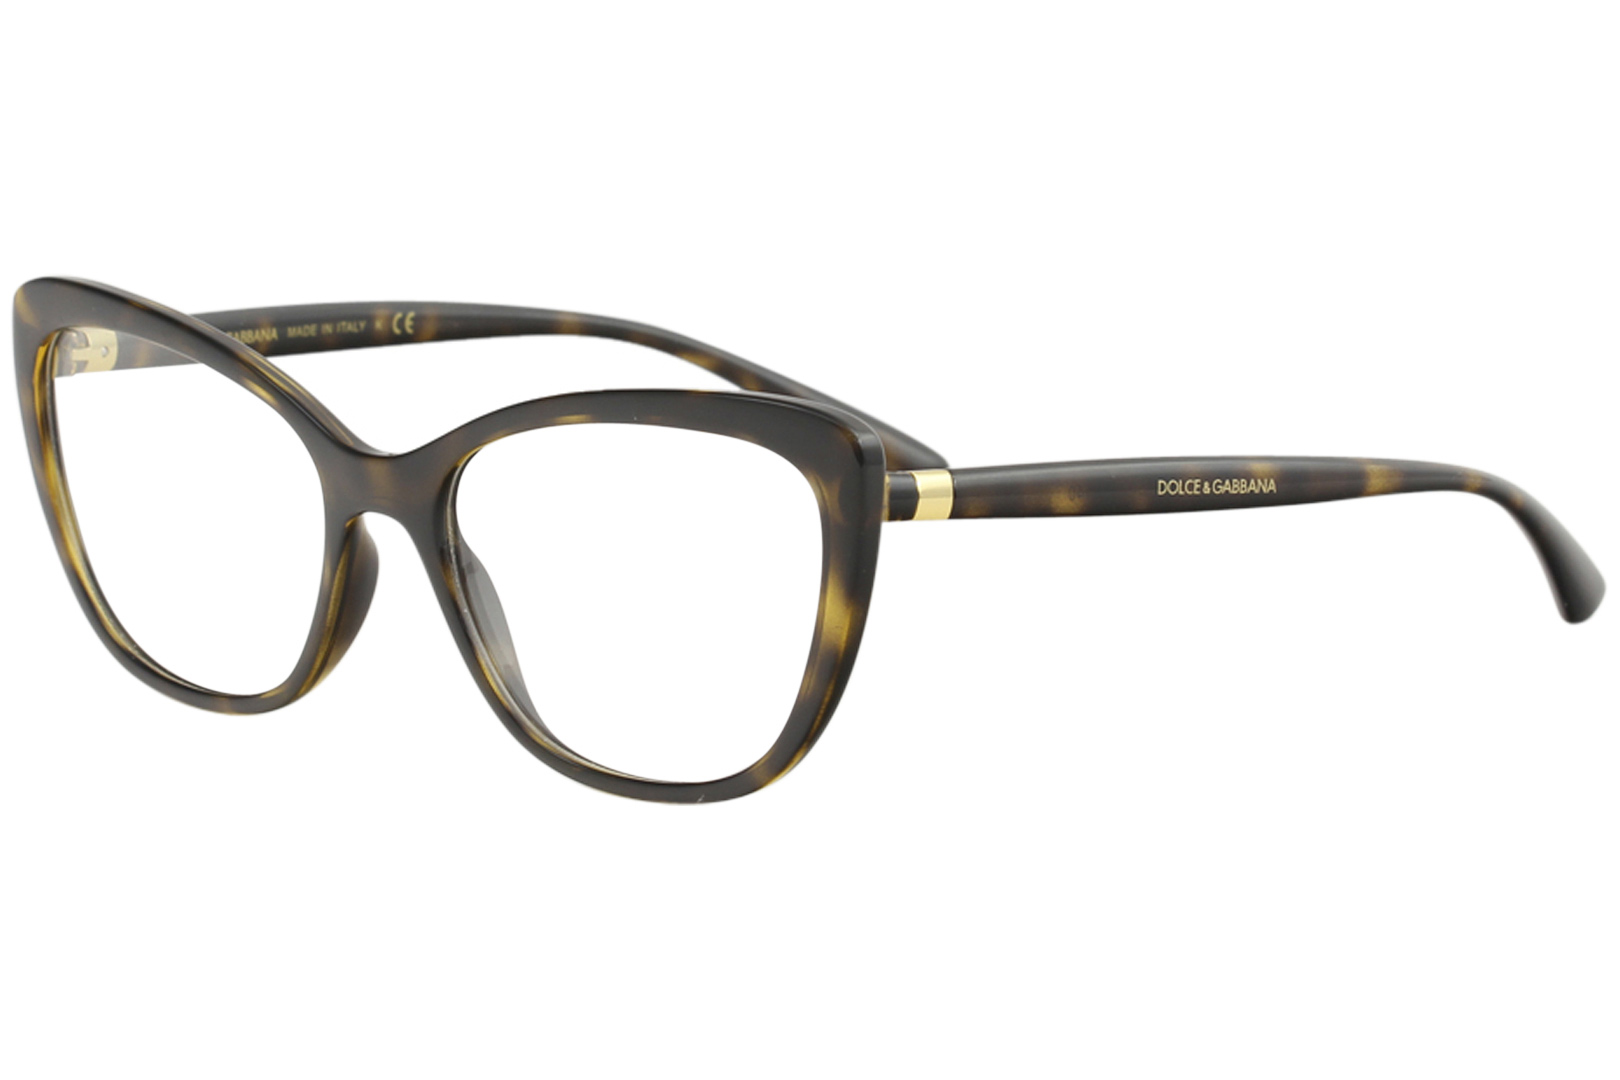 Dolce   Gabbana Eyeglasses D G DG5039 DG 5039 502 Havana Optical ... 656b0ba7d2